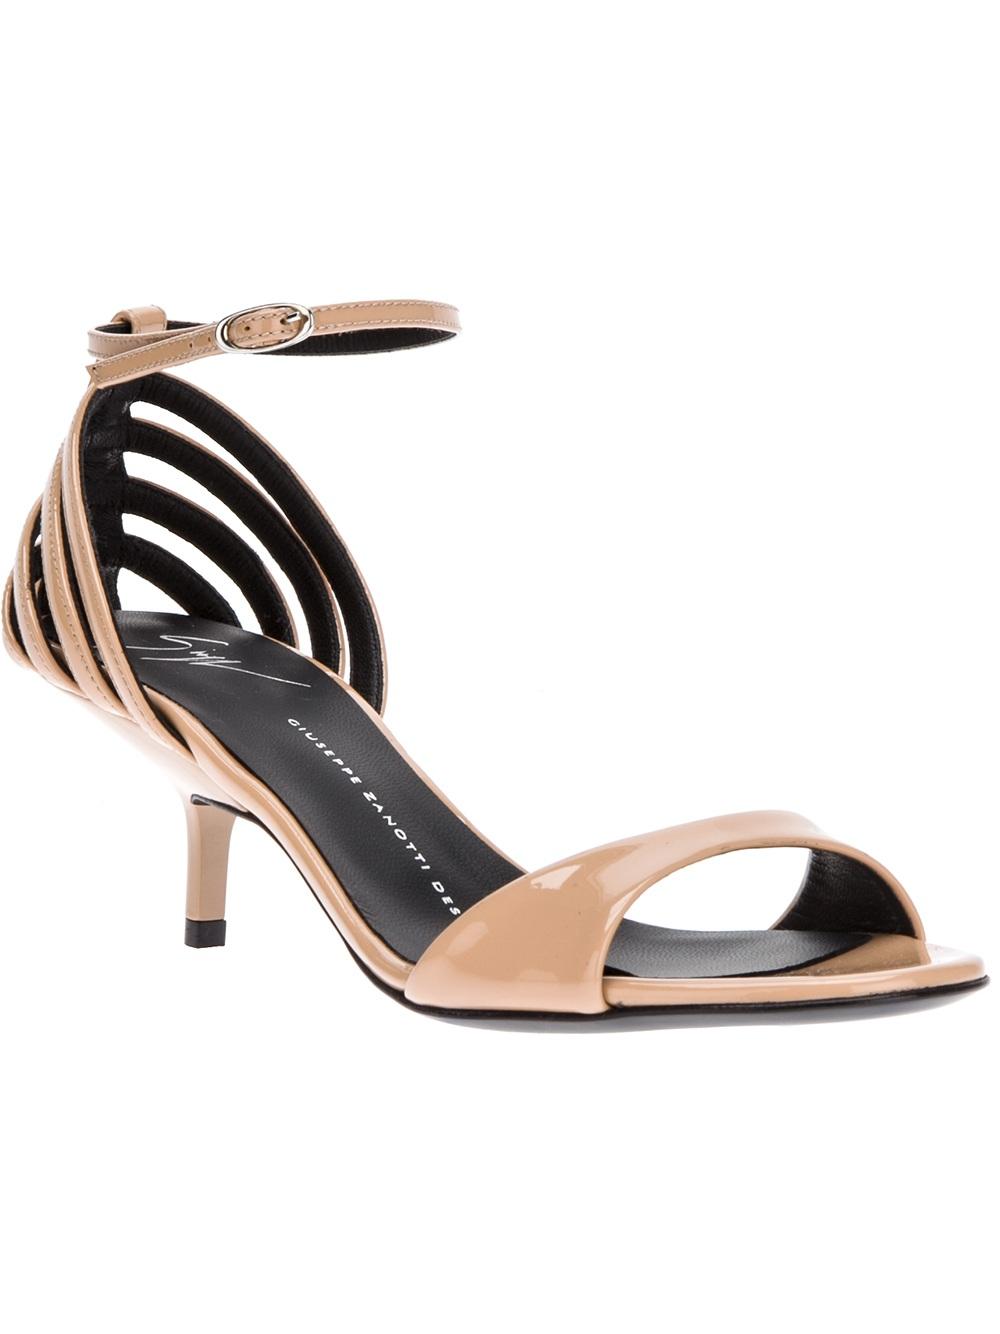 Black sandals 2 inch heel - Mid Heel Ankle Strap Sandals